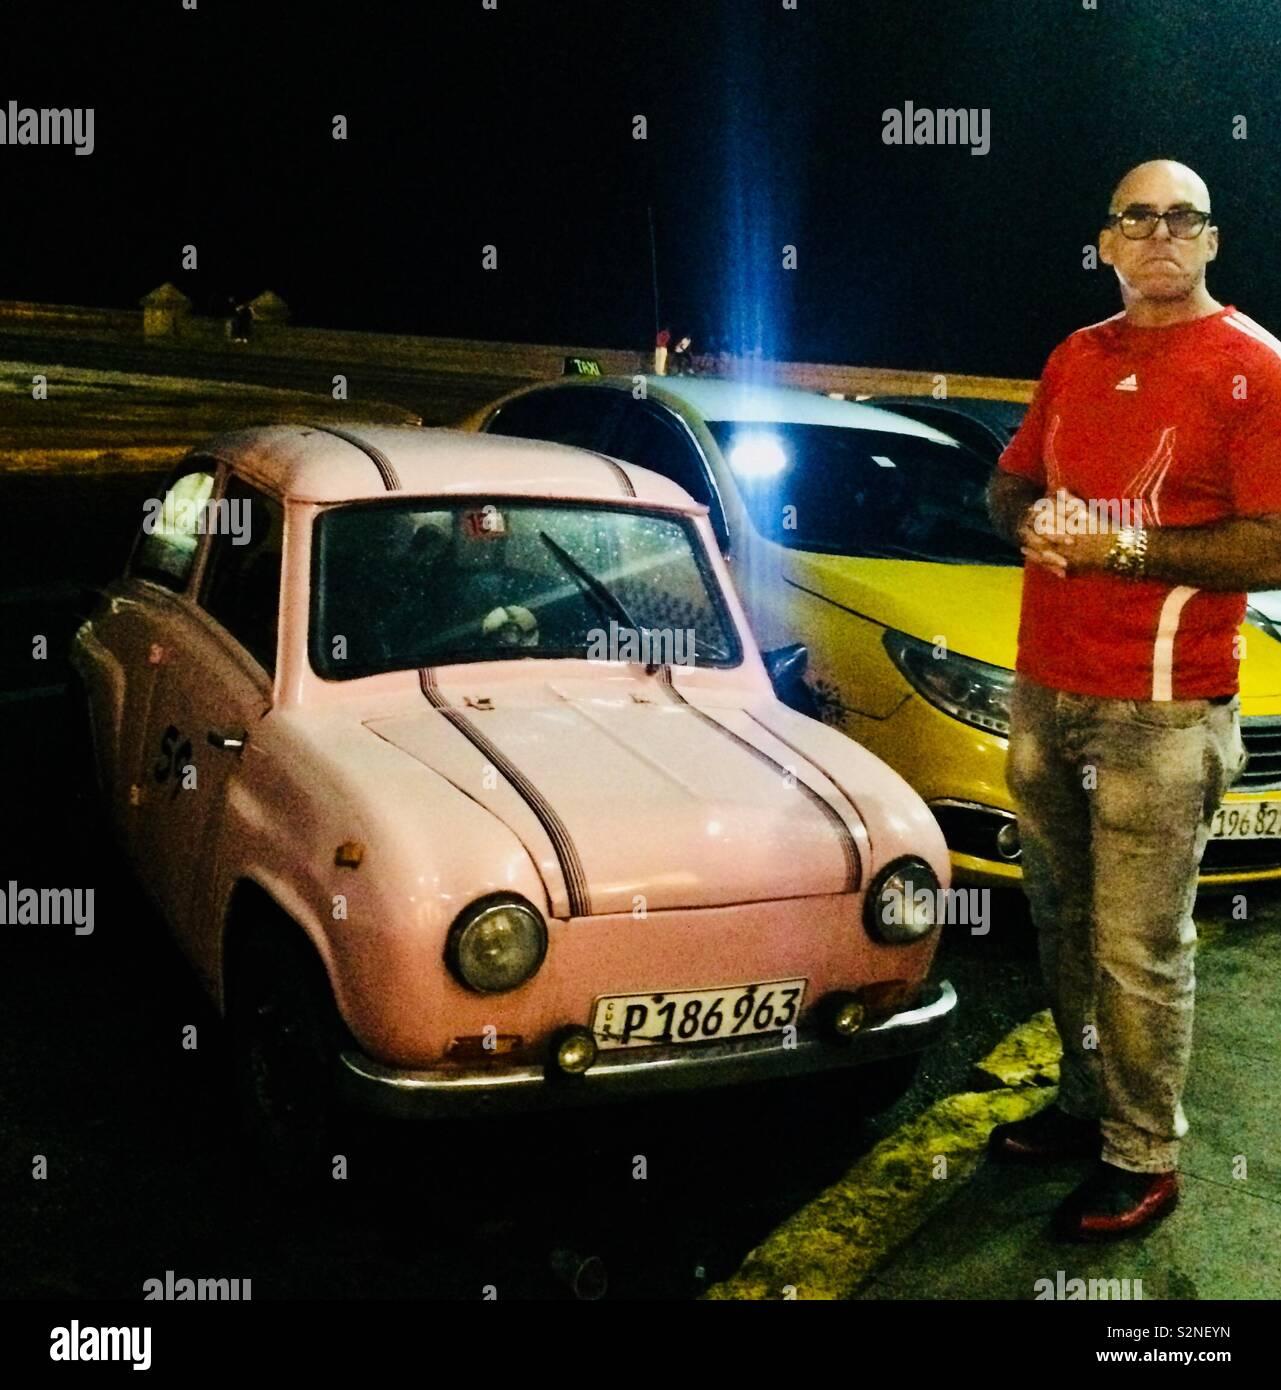 A tiny pink car in Havana Stock Photo